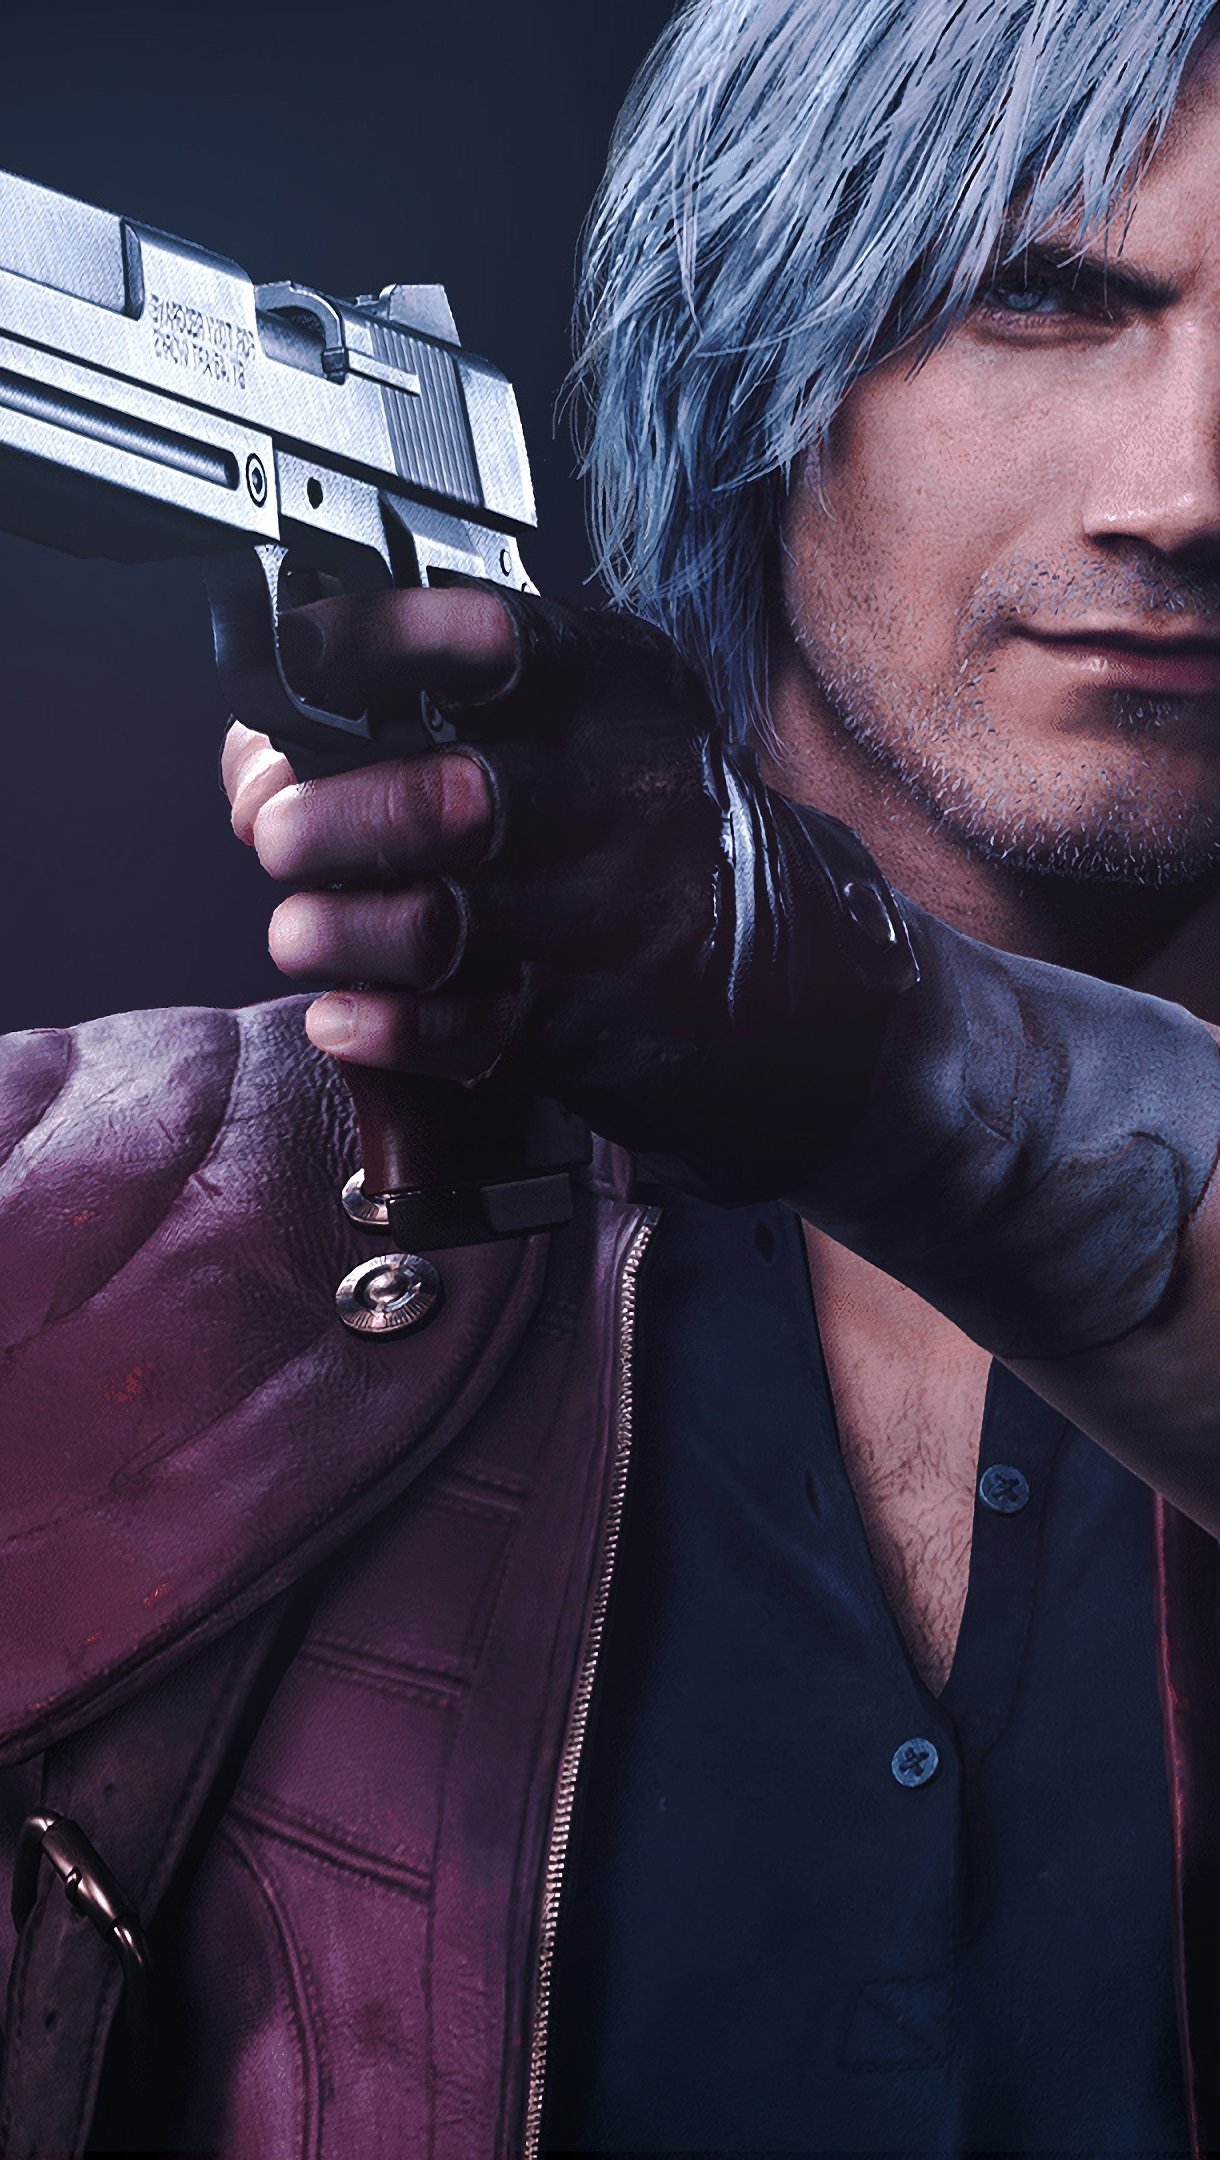 Fondos de pantalla Dante de Devil May Cry 5 Vertical